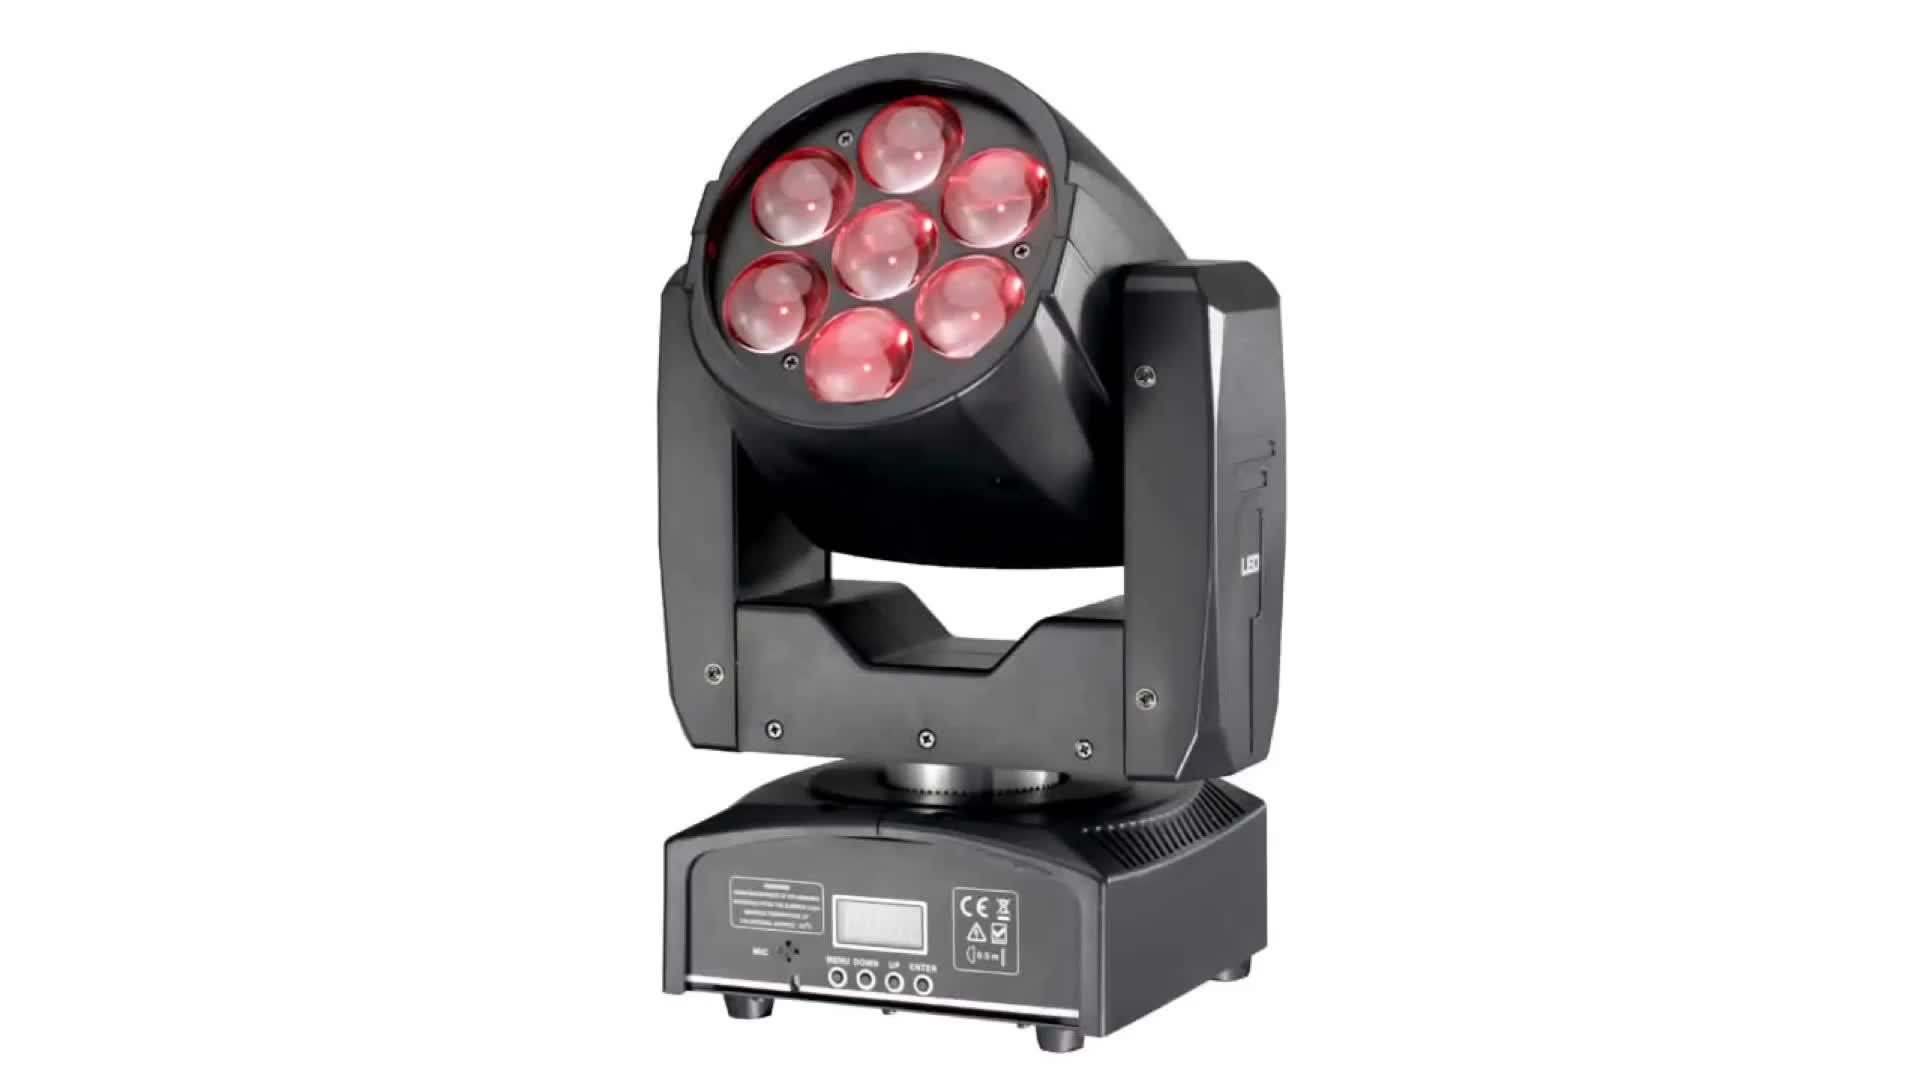 DJ stage mini lighting beam 7x12w rgbw led zoom wash led moving head